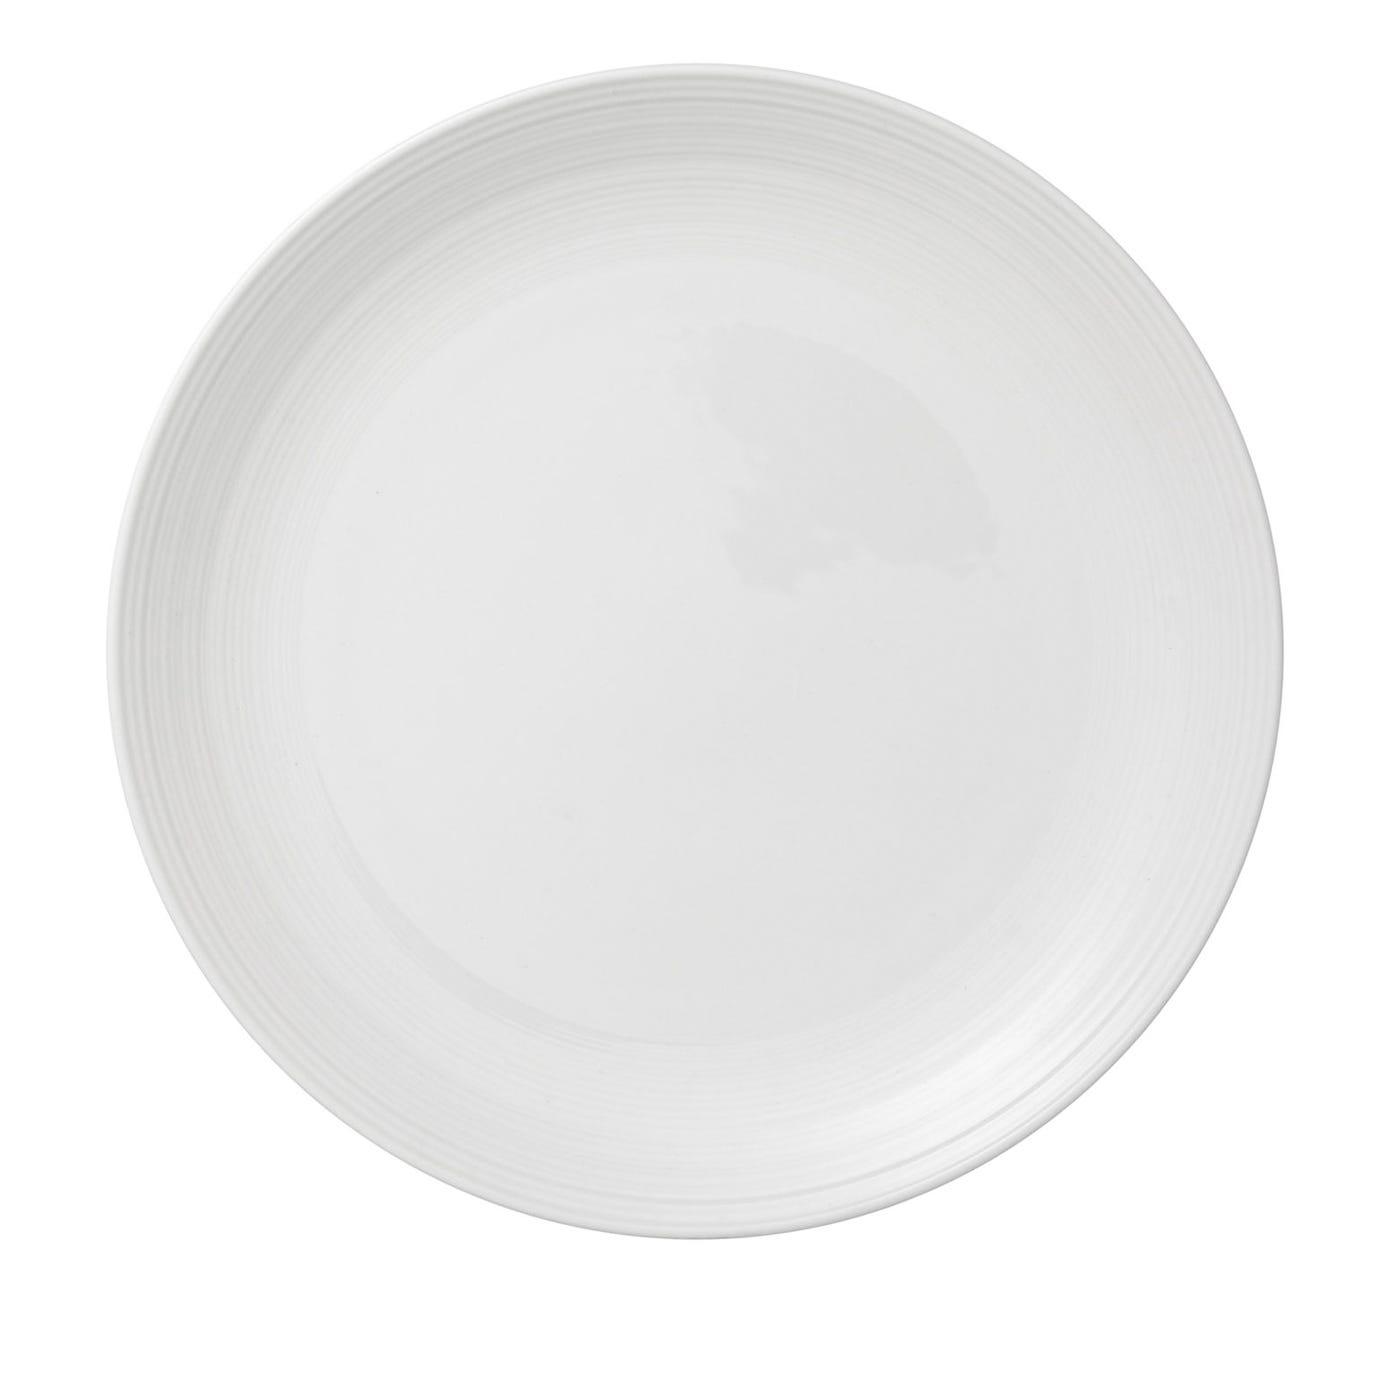 Loft White Round Dish